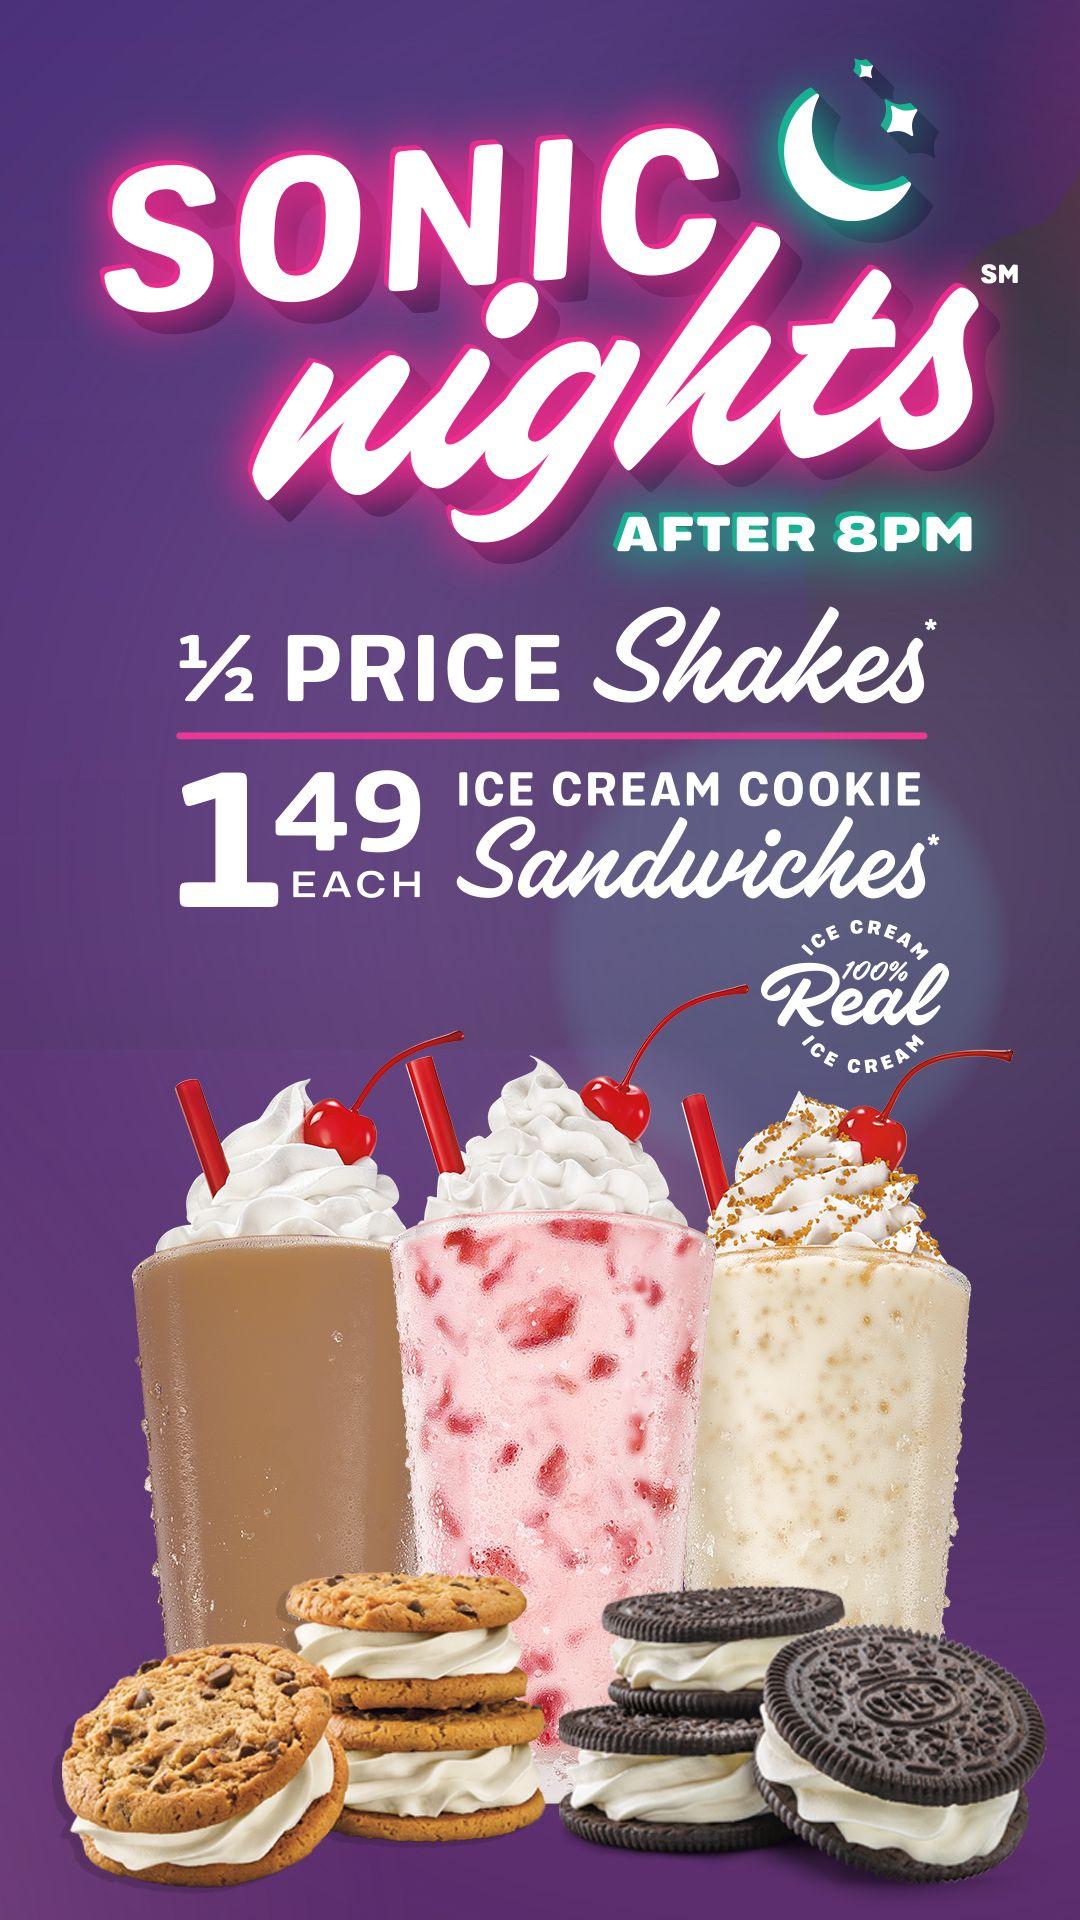 Mom deal sonic nights 12 price shakes 149 ice cream